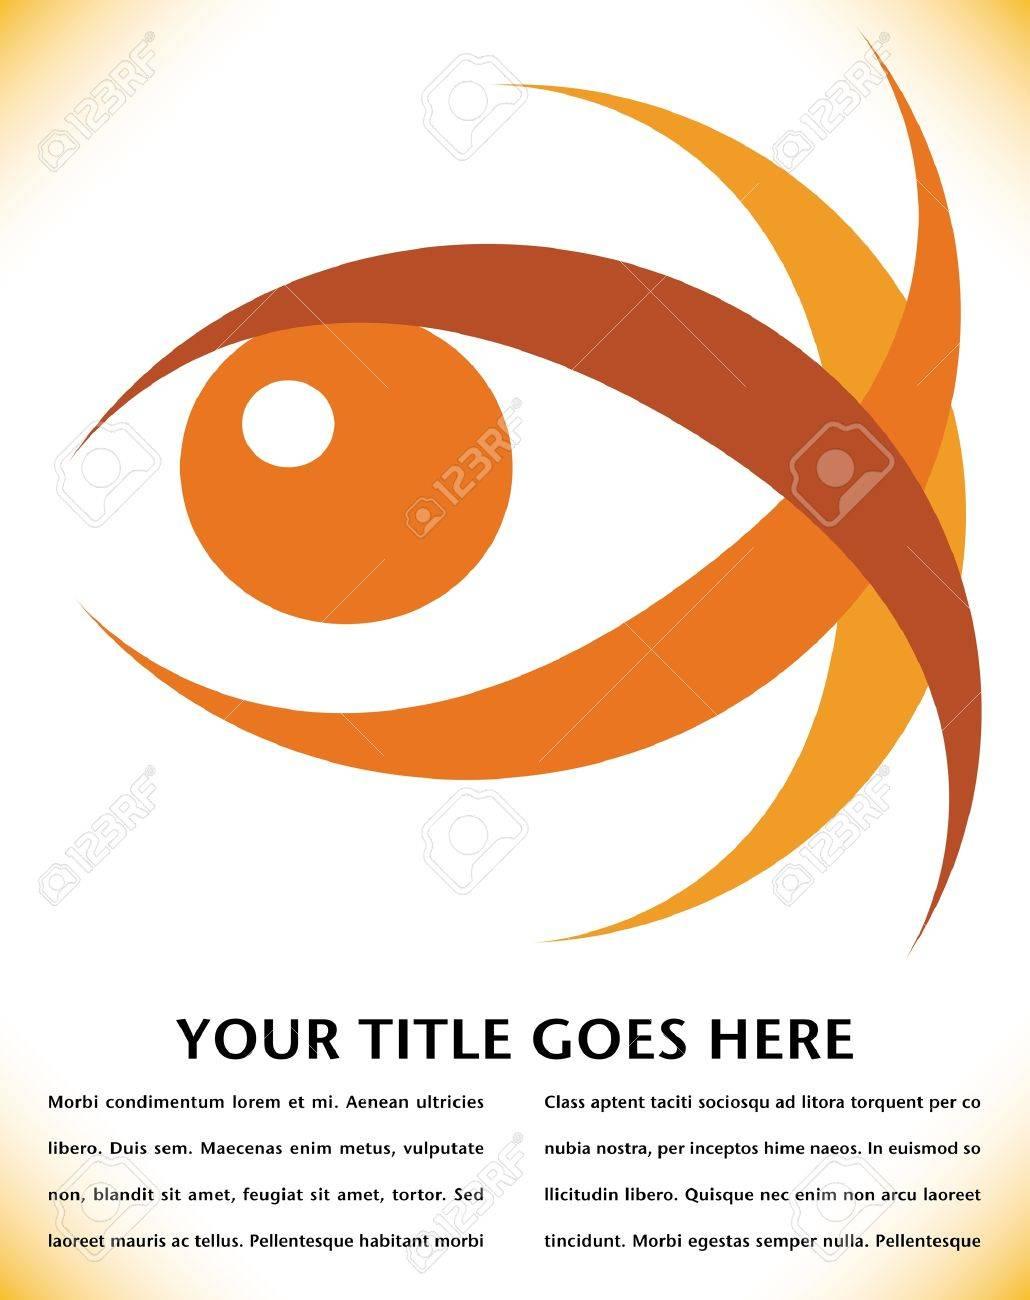 Striking eye design with copy space vector. Stock Vector - 10316713